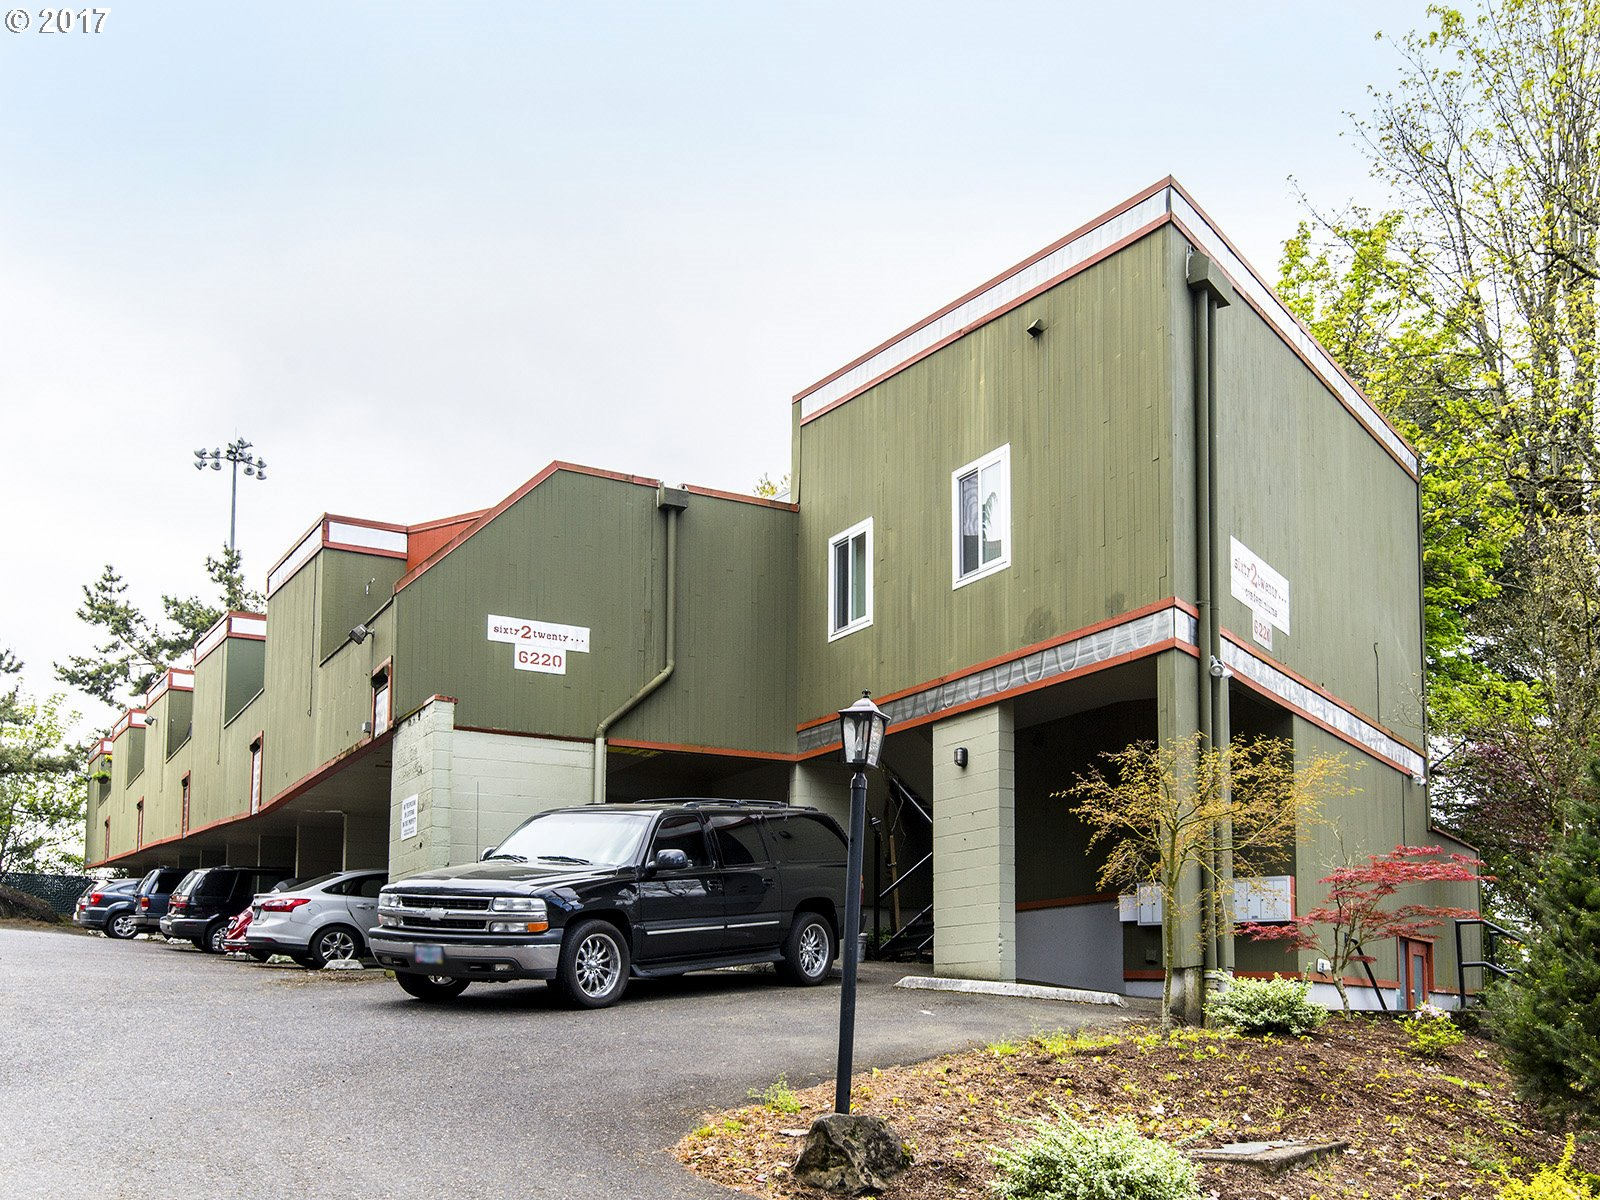 6220 SW CAPITOL HWY 8, Portland, OR 97239